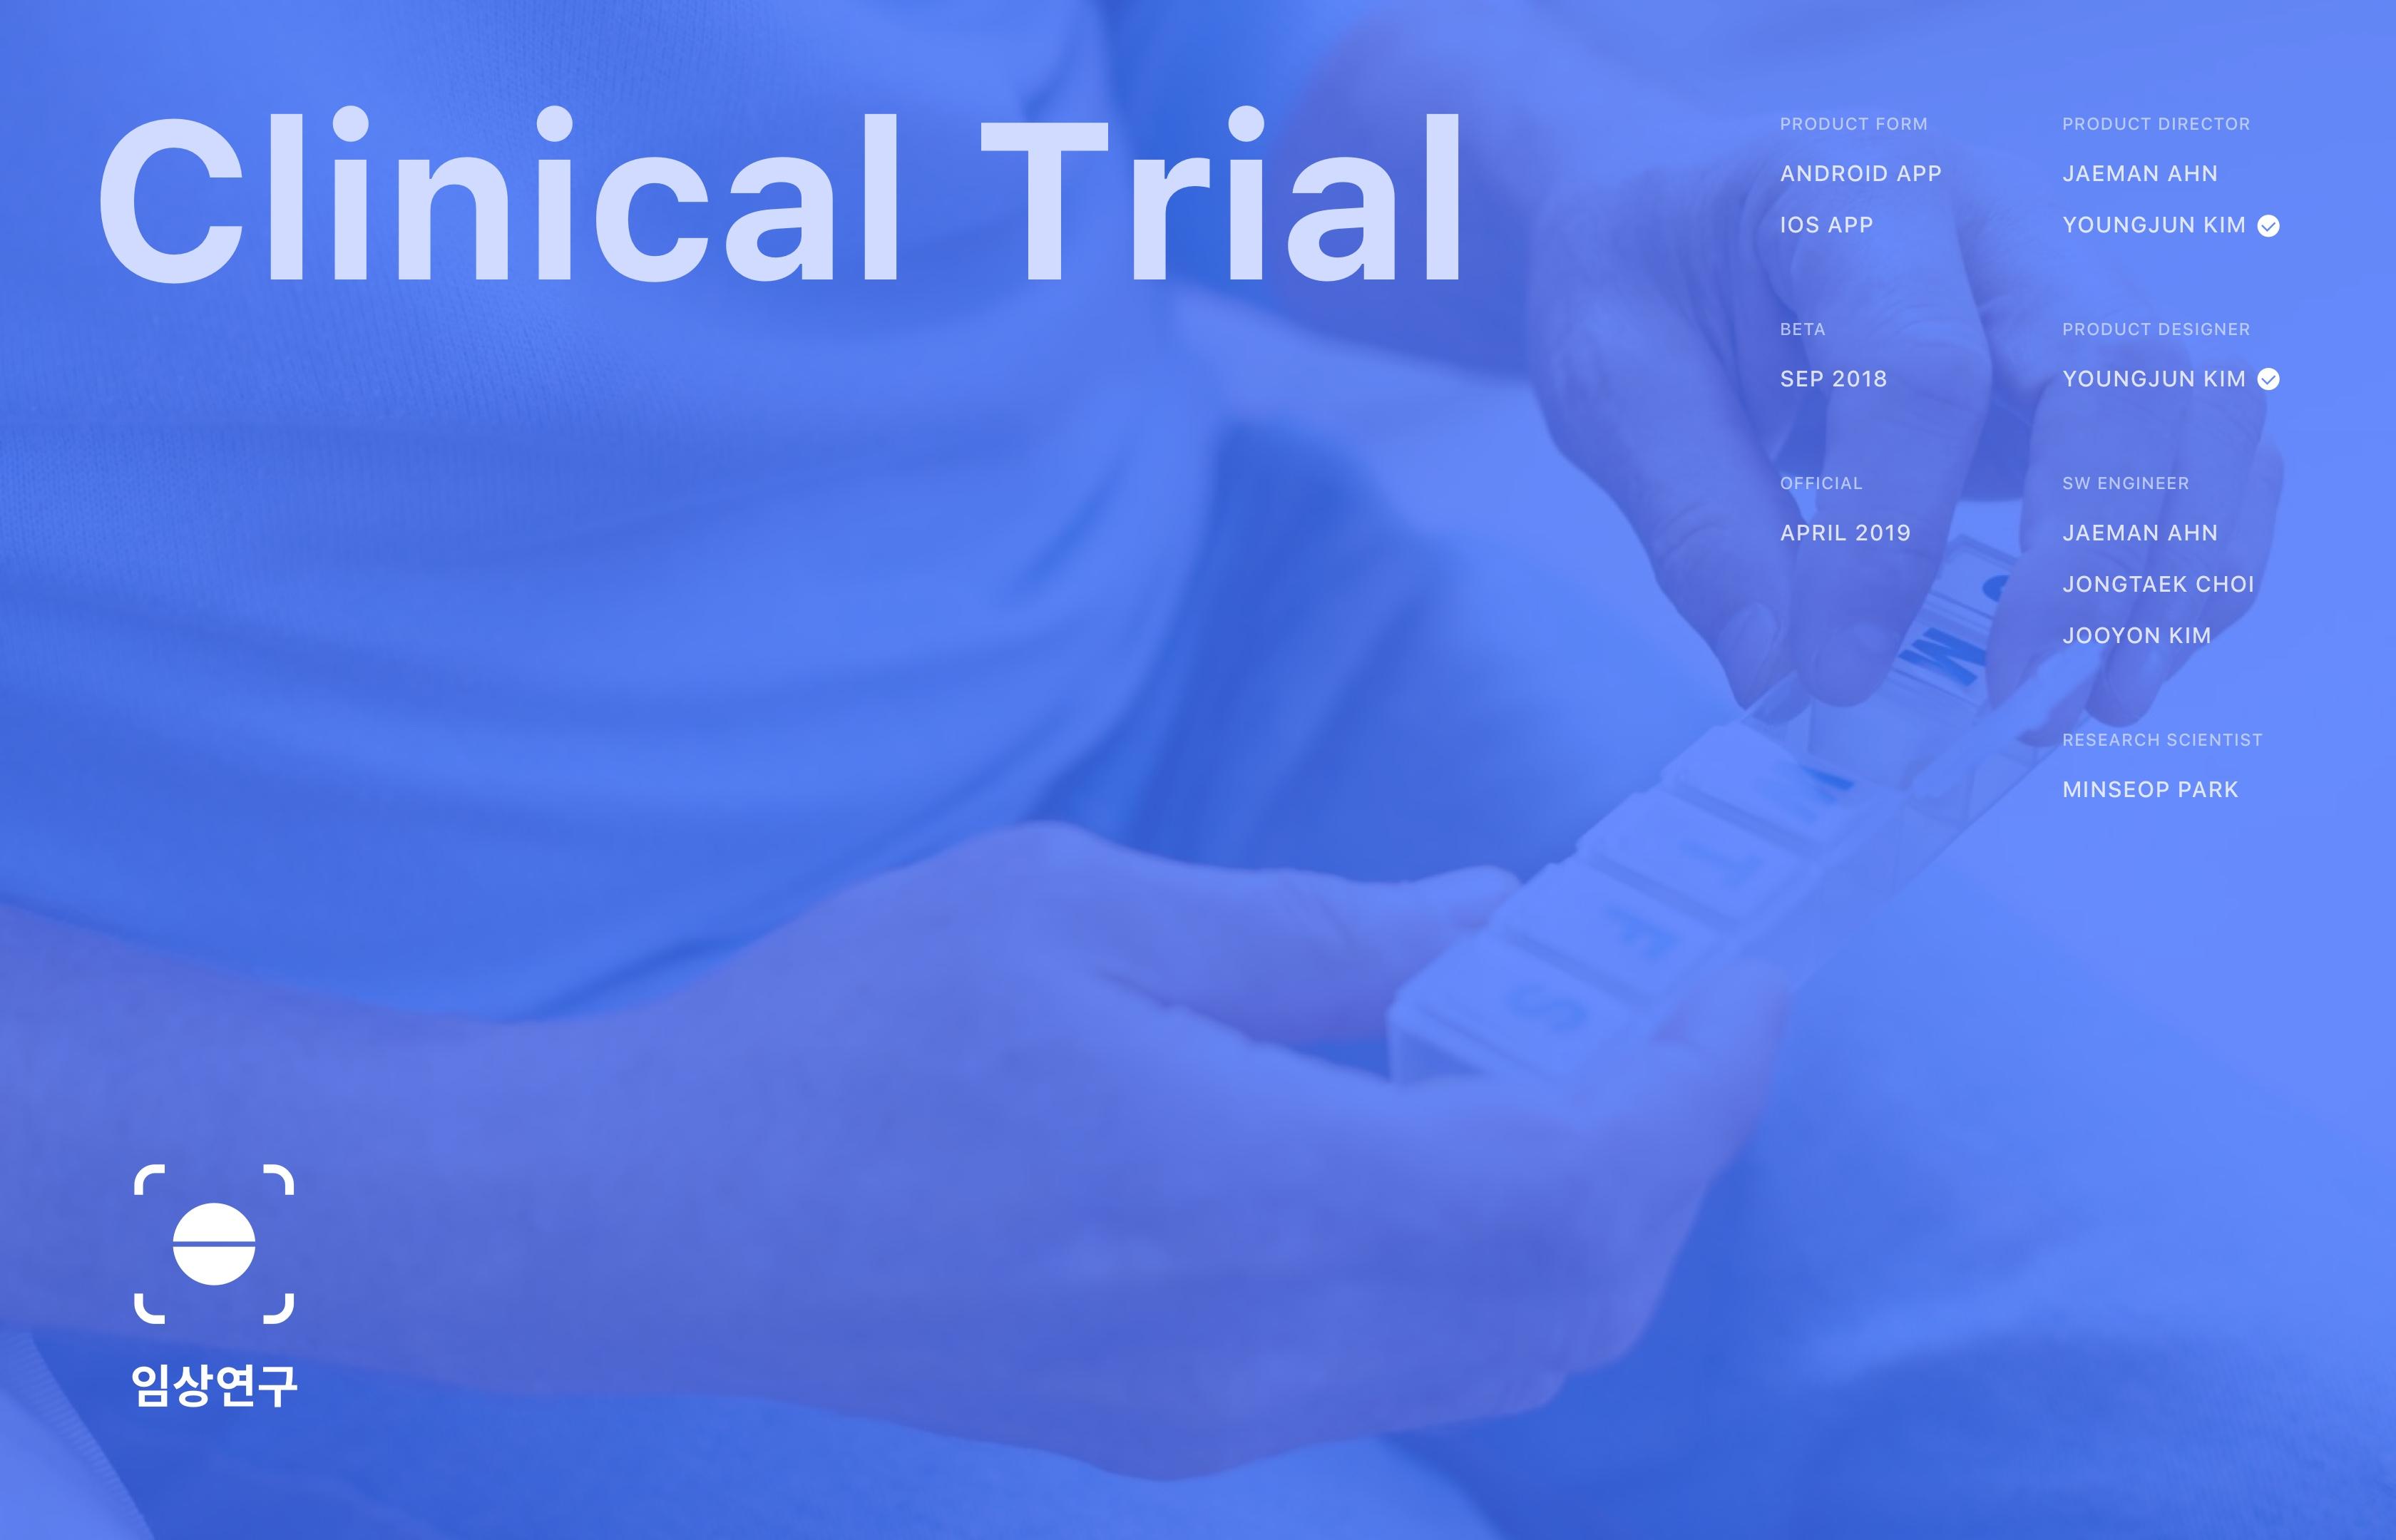 clinical trial - Youngjun Kim